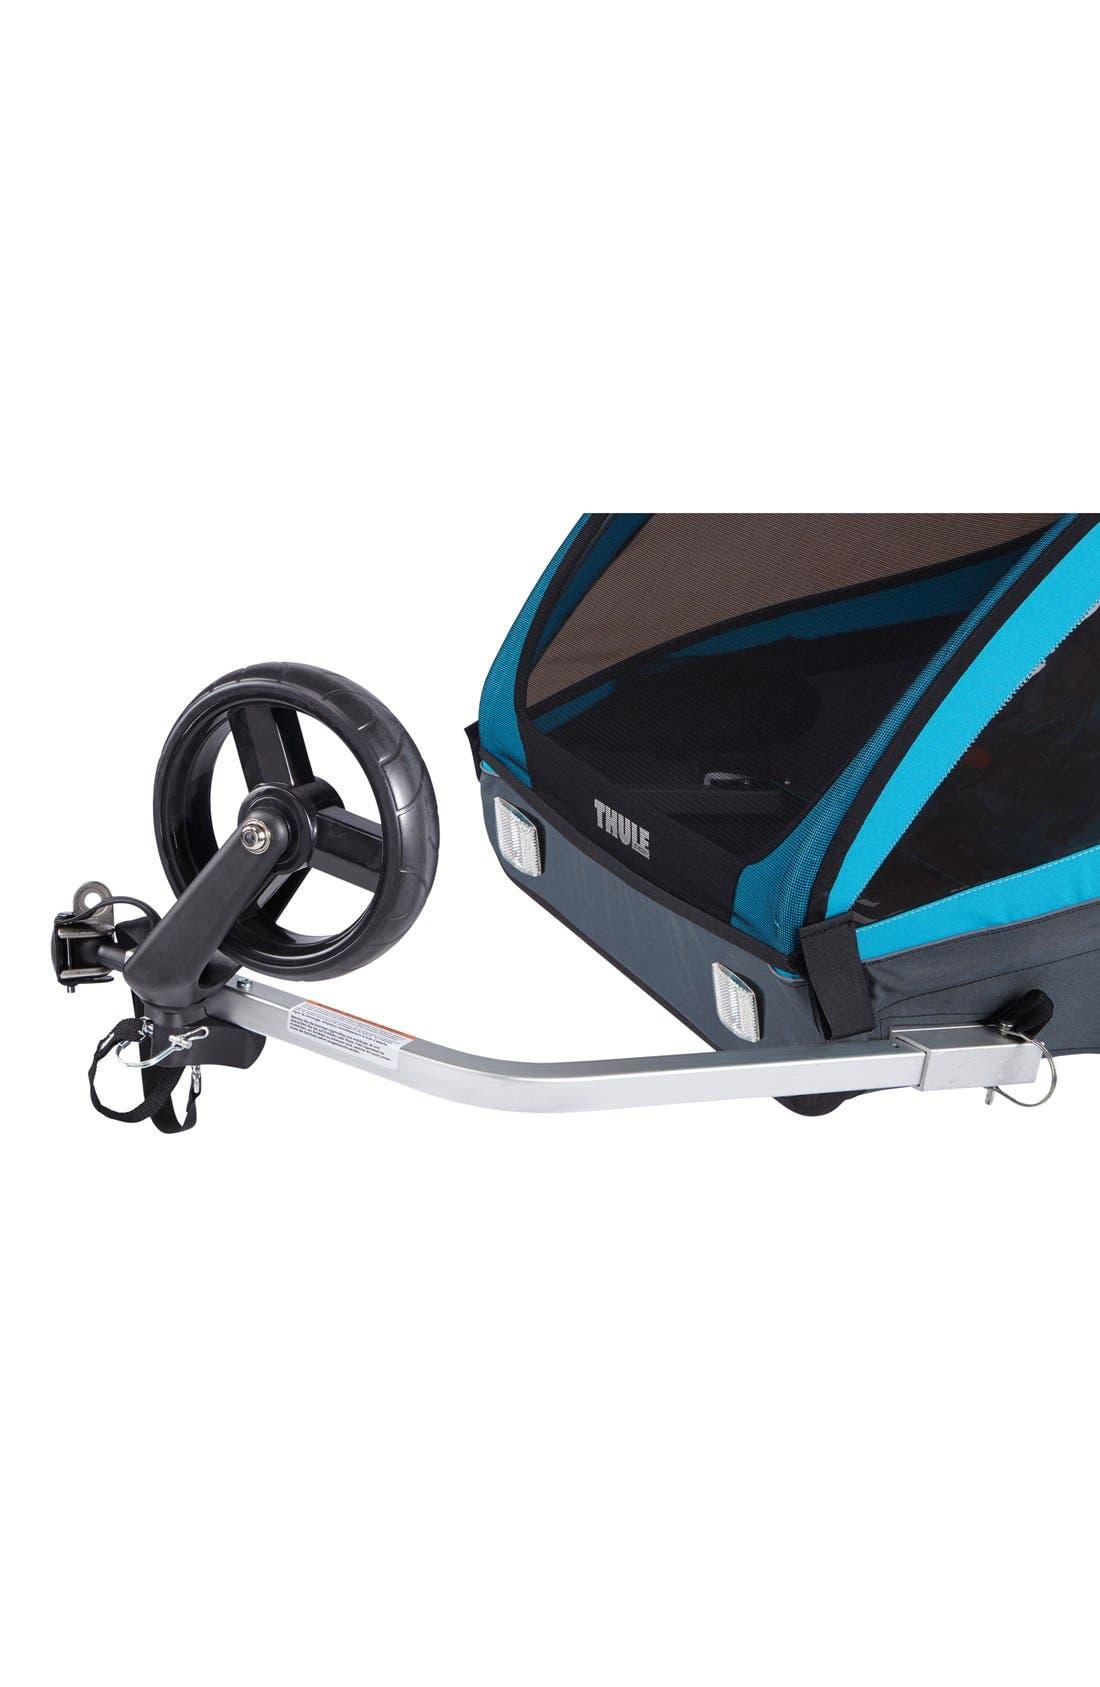 Coaster XT Double Seat Bike Trailer,                             Alternate thumbnail 8, color,                             Blue